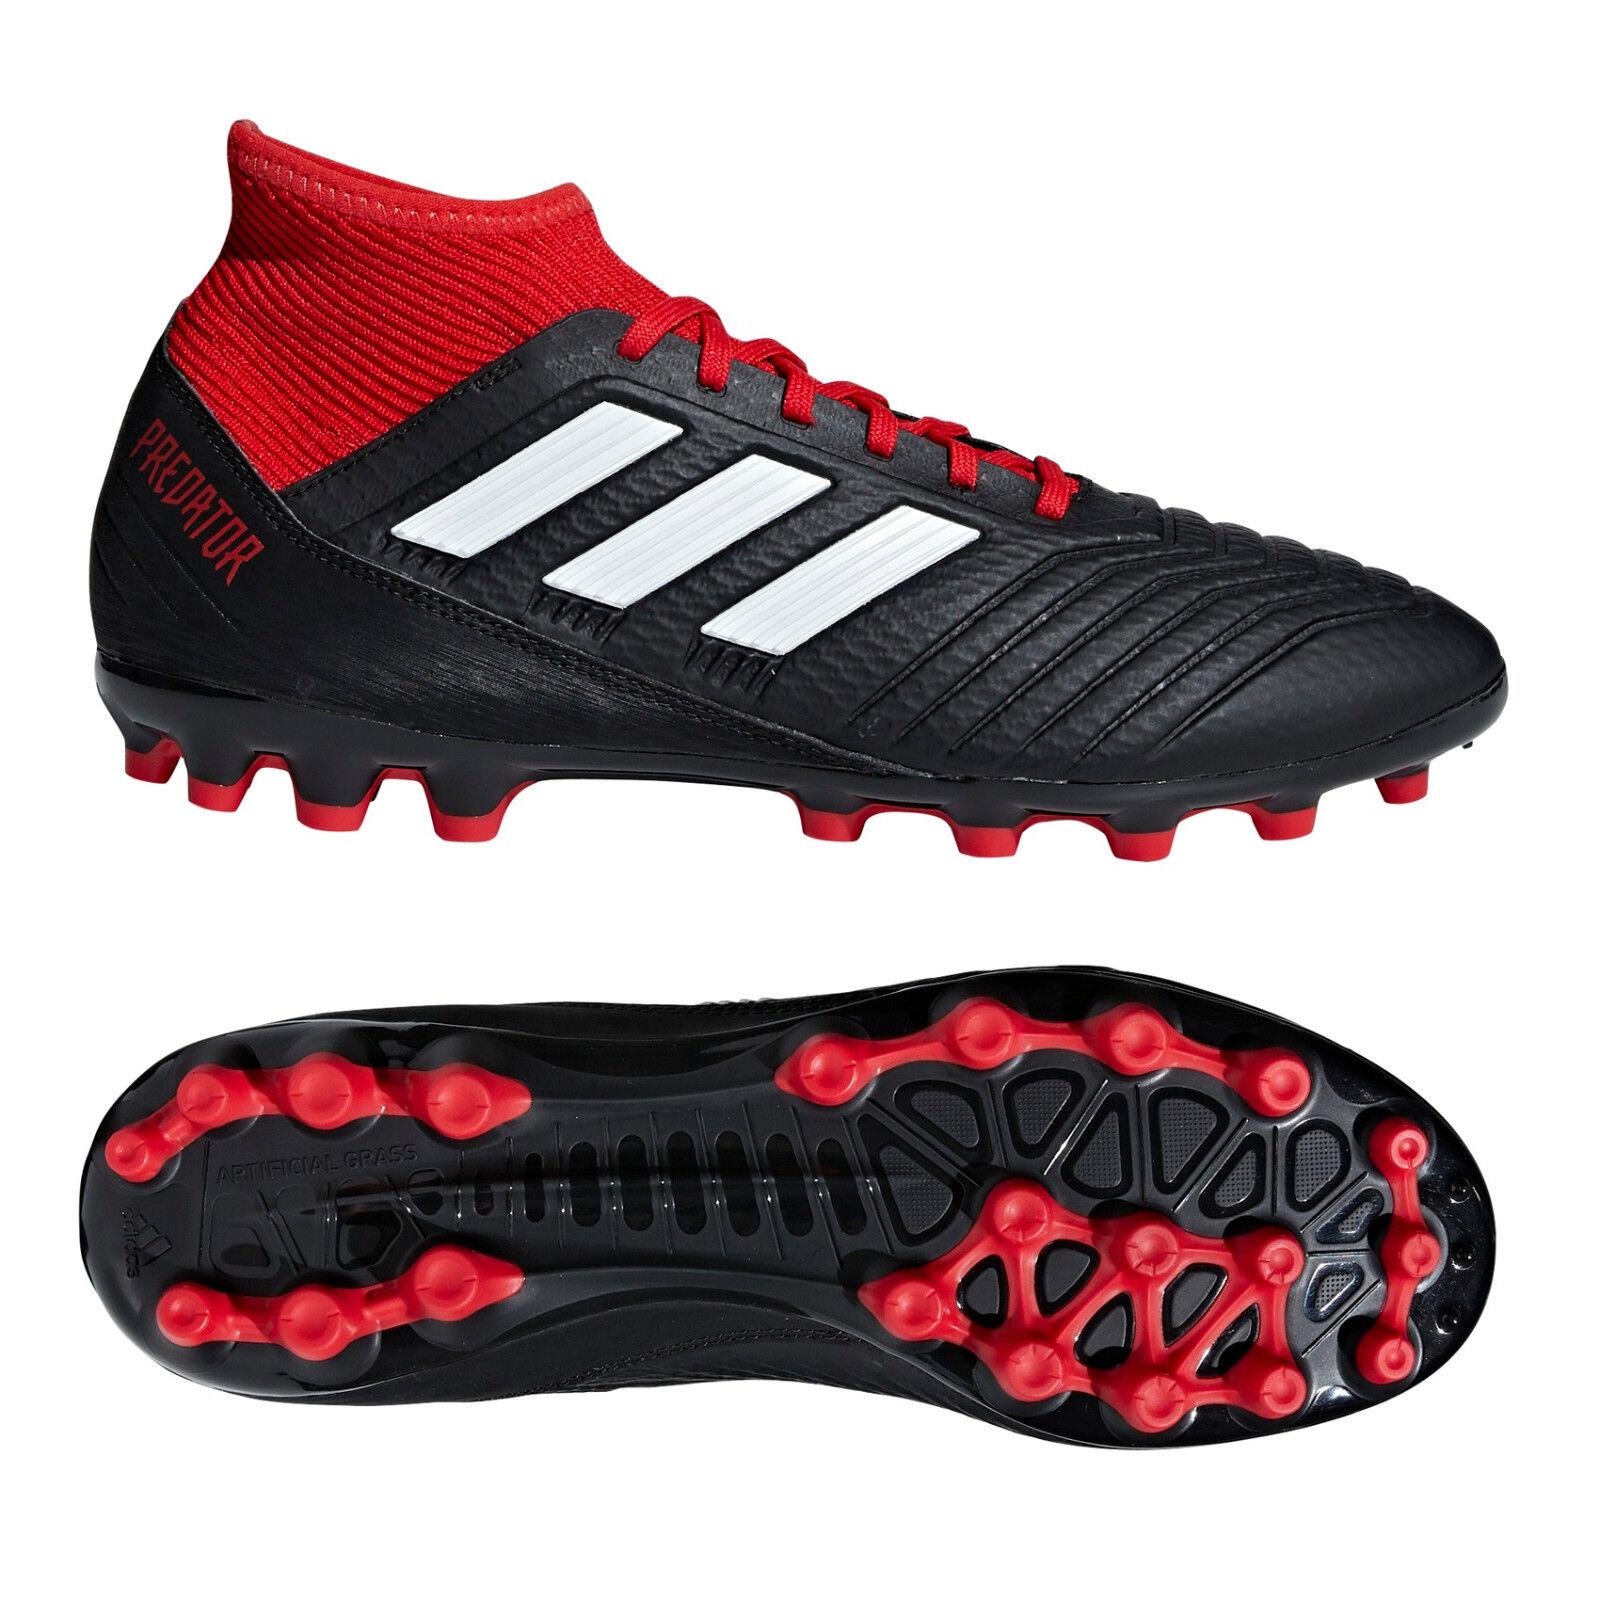 2fc204e36080 Adidas Predator 18.3 44 2 3 Kunstrasen Fußballschuh NEU UVP Artificial AG  npgnrn3362-Football Boots